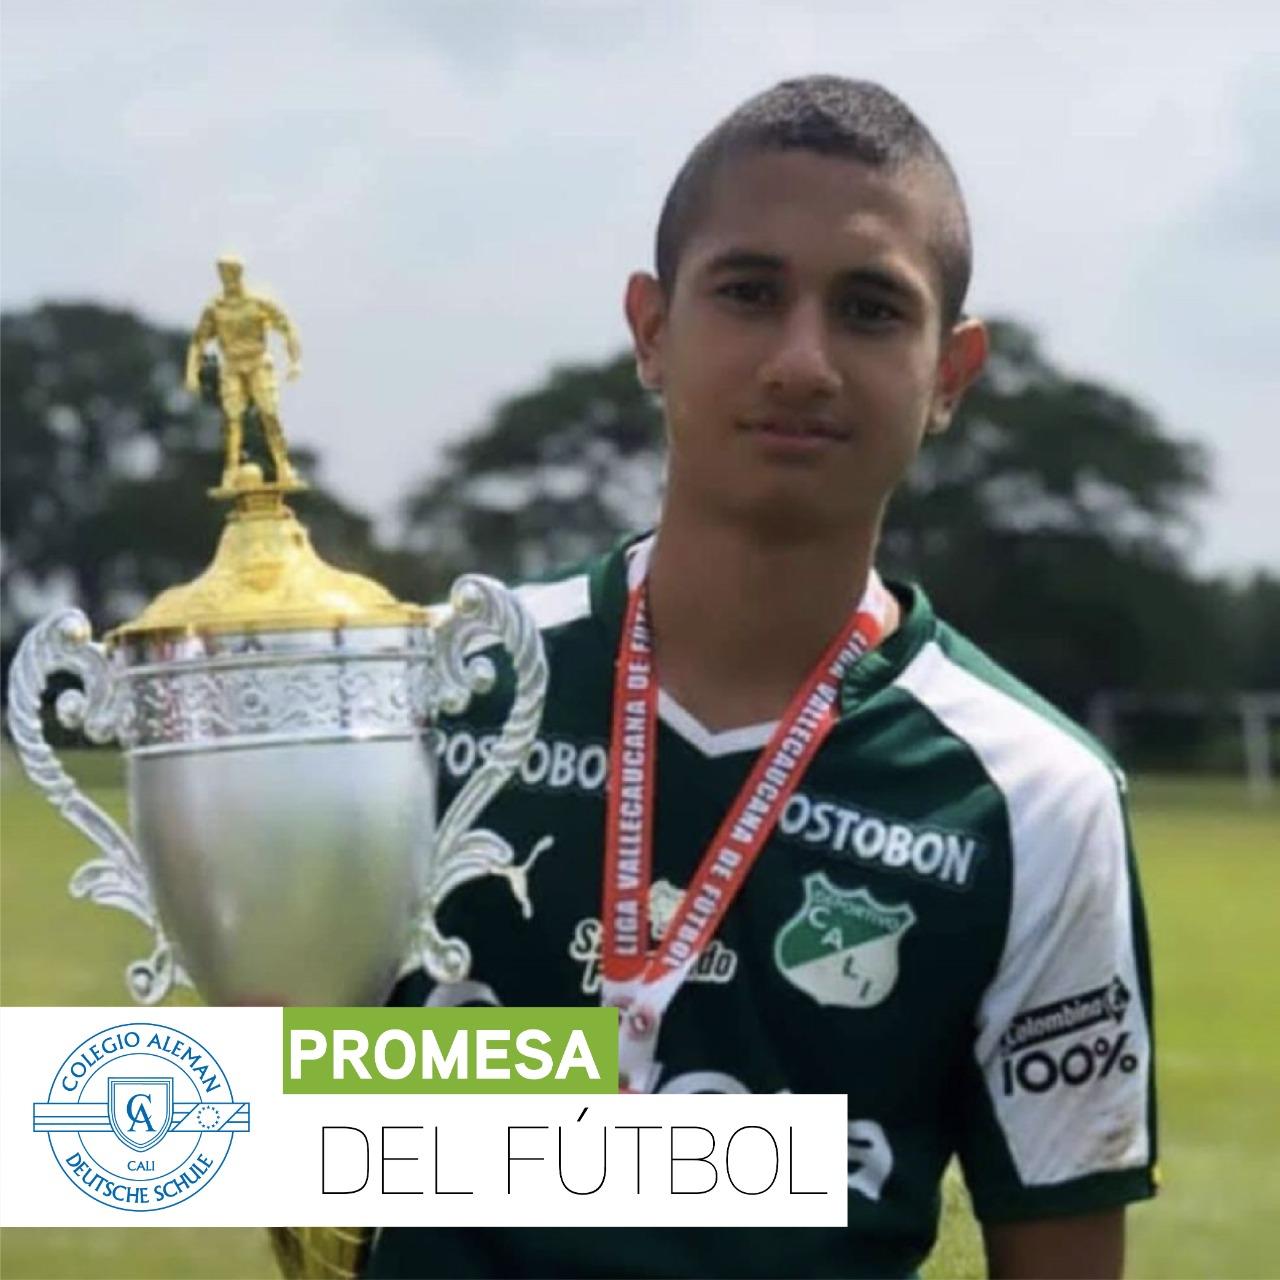 José Alejandro Mazorra Díaz  | Promesa del fútbol